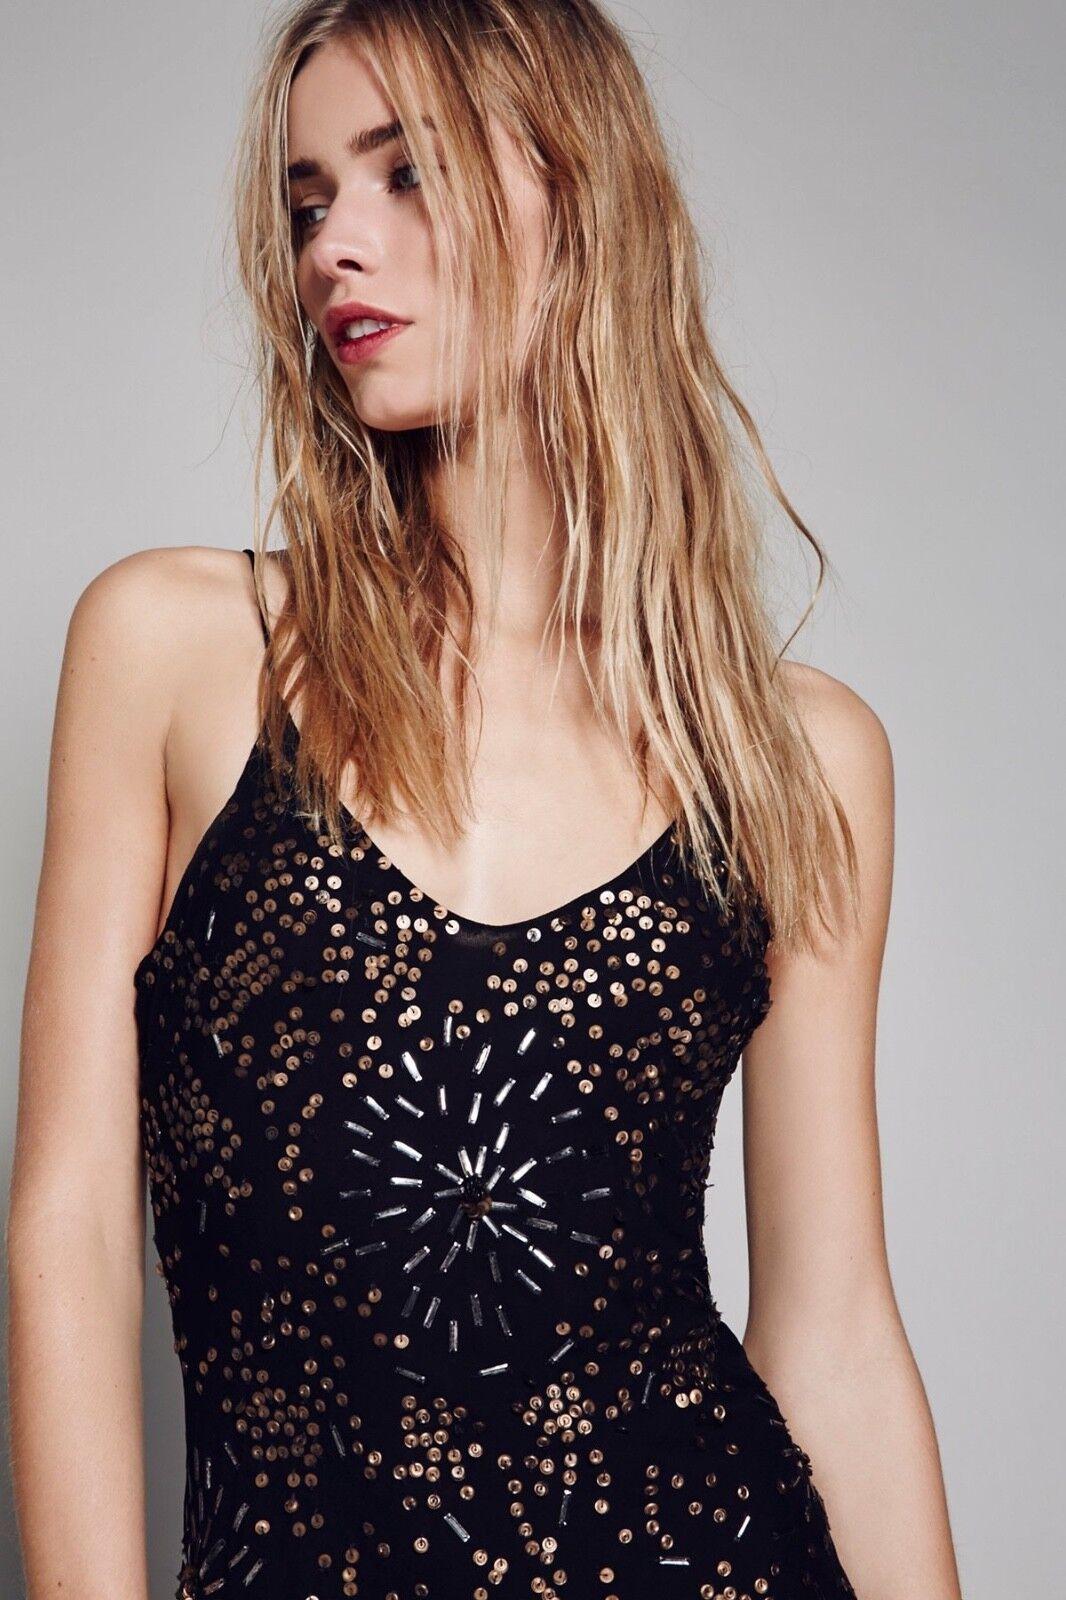 New  275.00 275.00 275.00 Free People Gaudi Slip Dress By Jen's Pirate Booty Medium  Caviar  40b63c